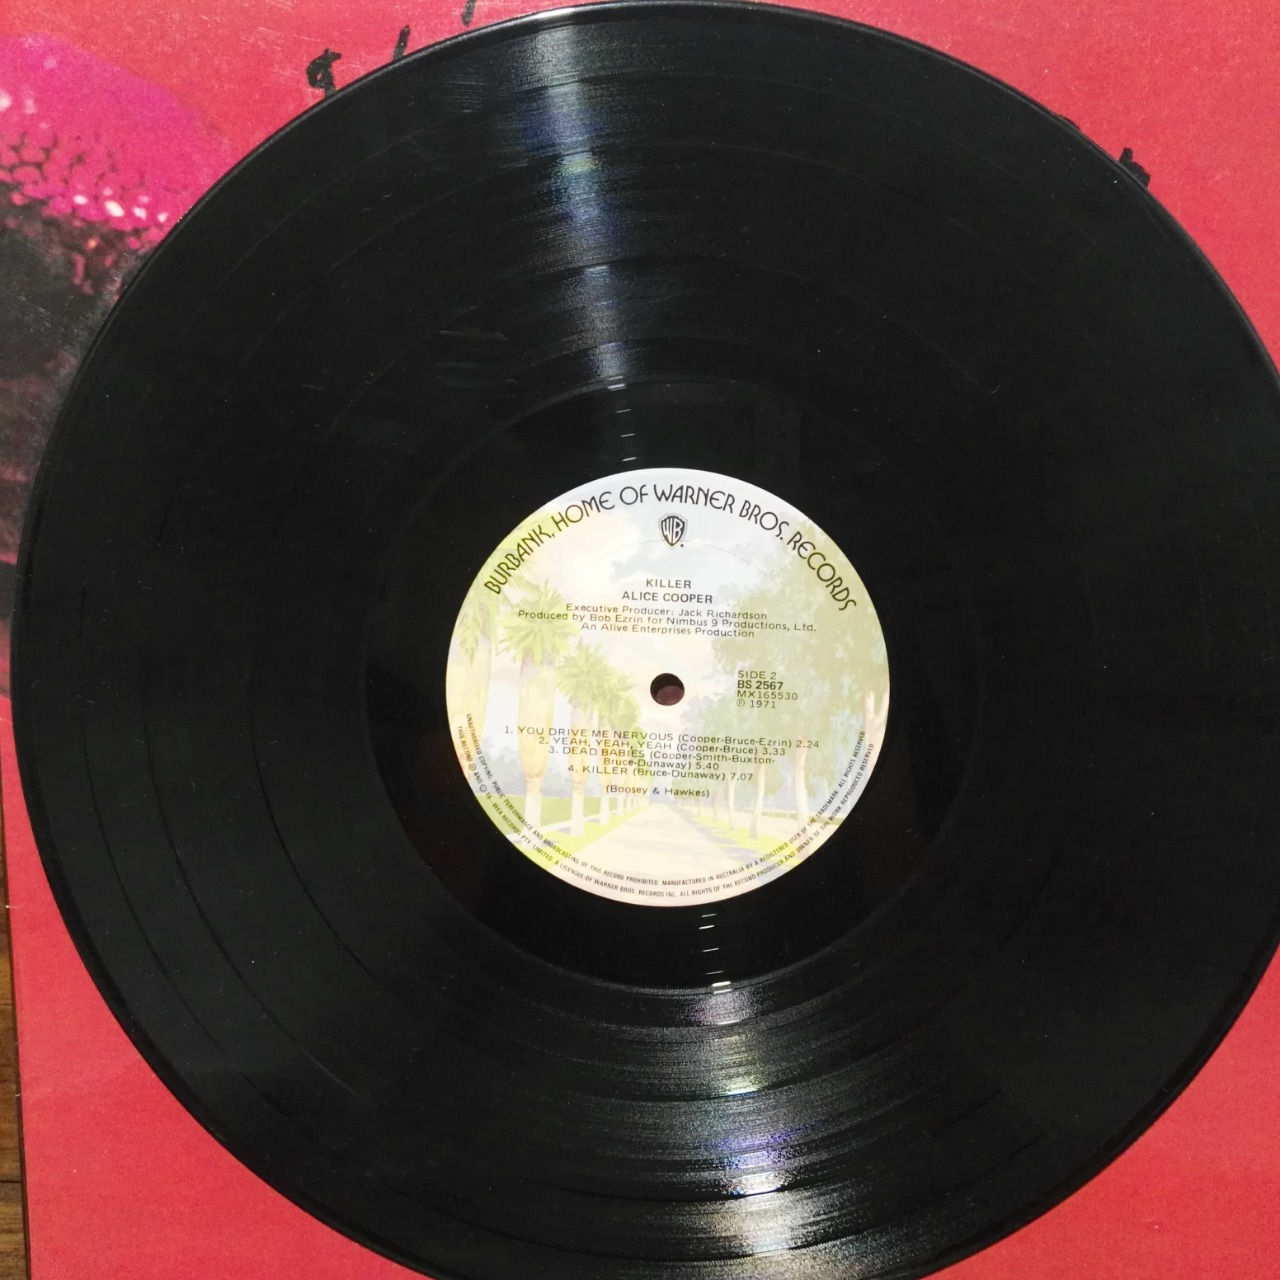 Vinyl Album Alice Cooper - Killer